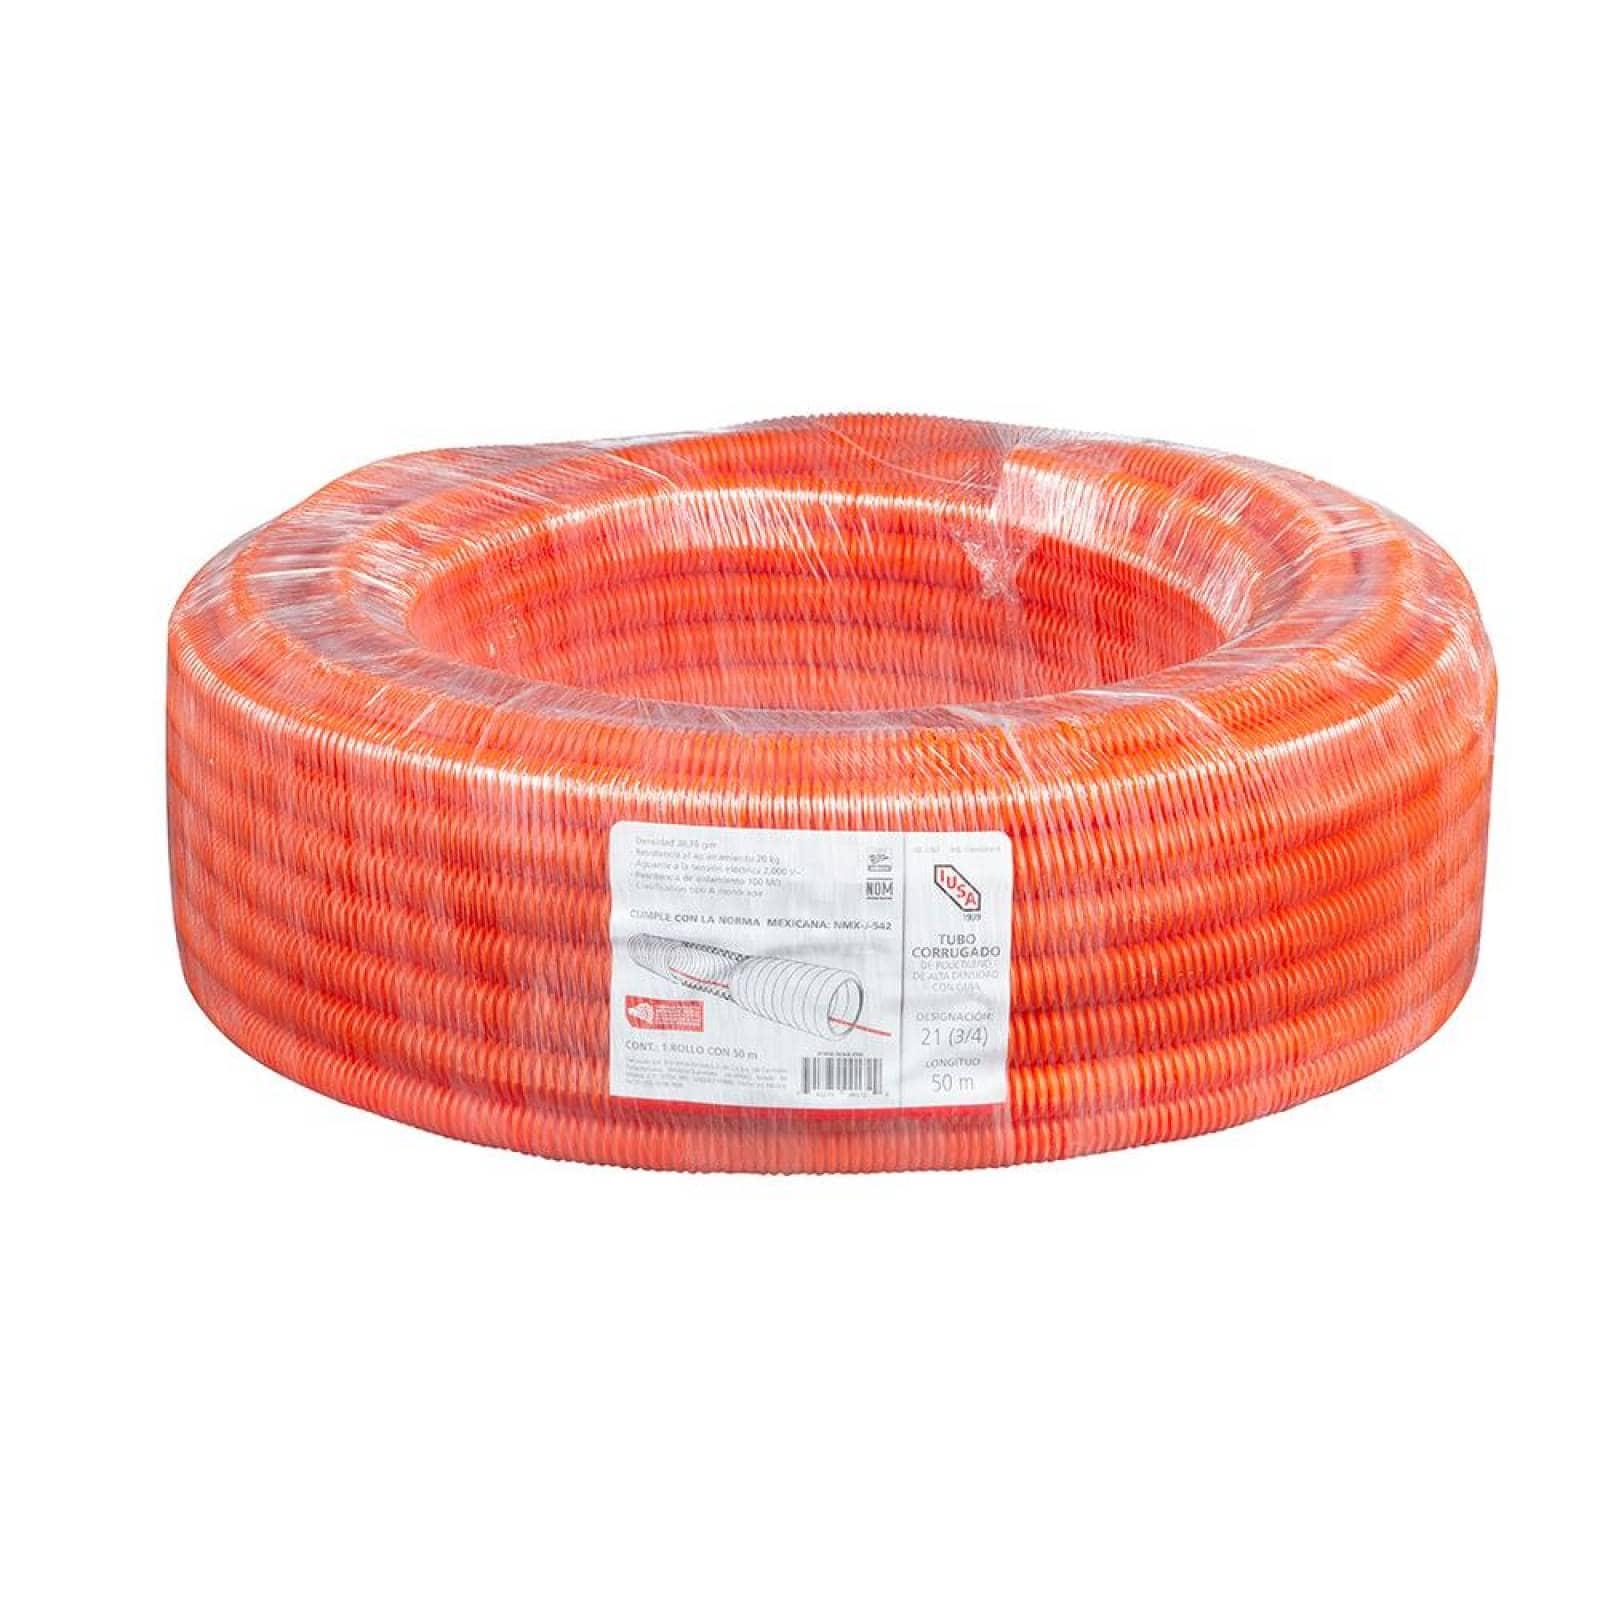 Poliducto corrugado 34 rollo 50 m